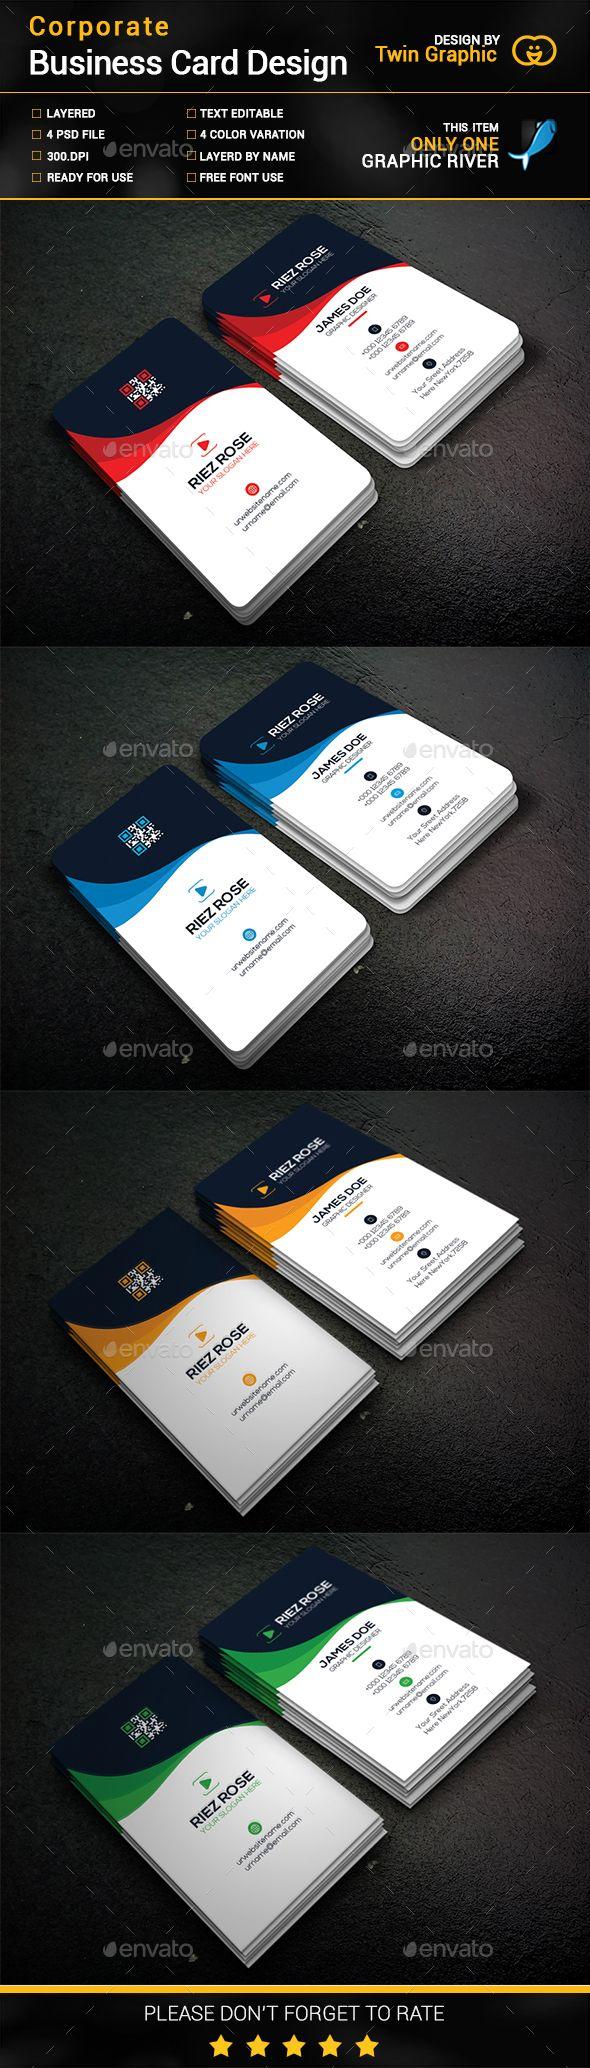 Corporate business card design template psd download here http corporate business card design template psd download here http graphicriver reheart Gallery